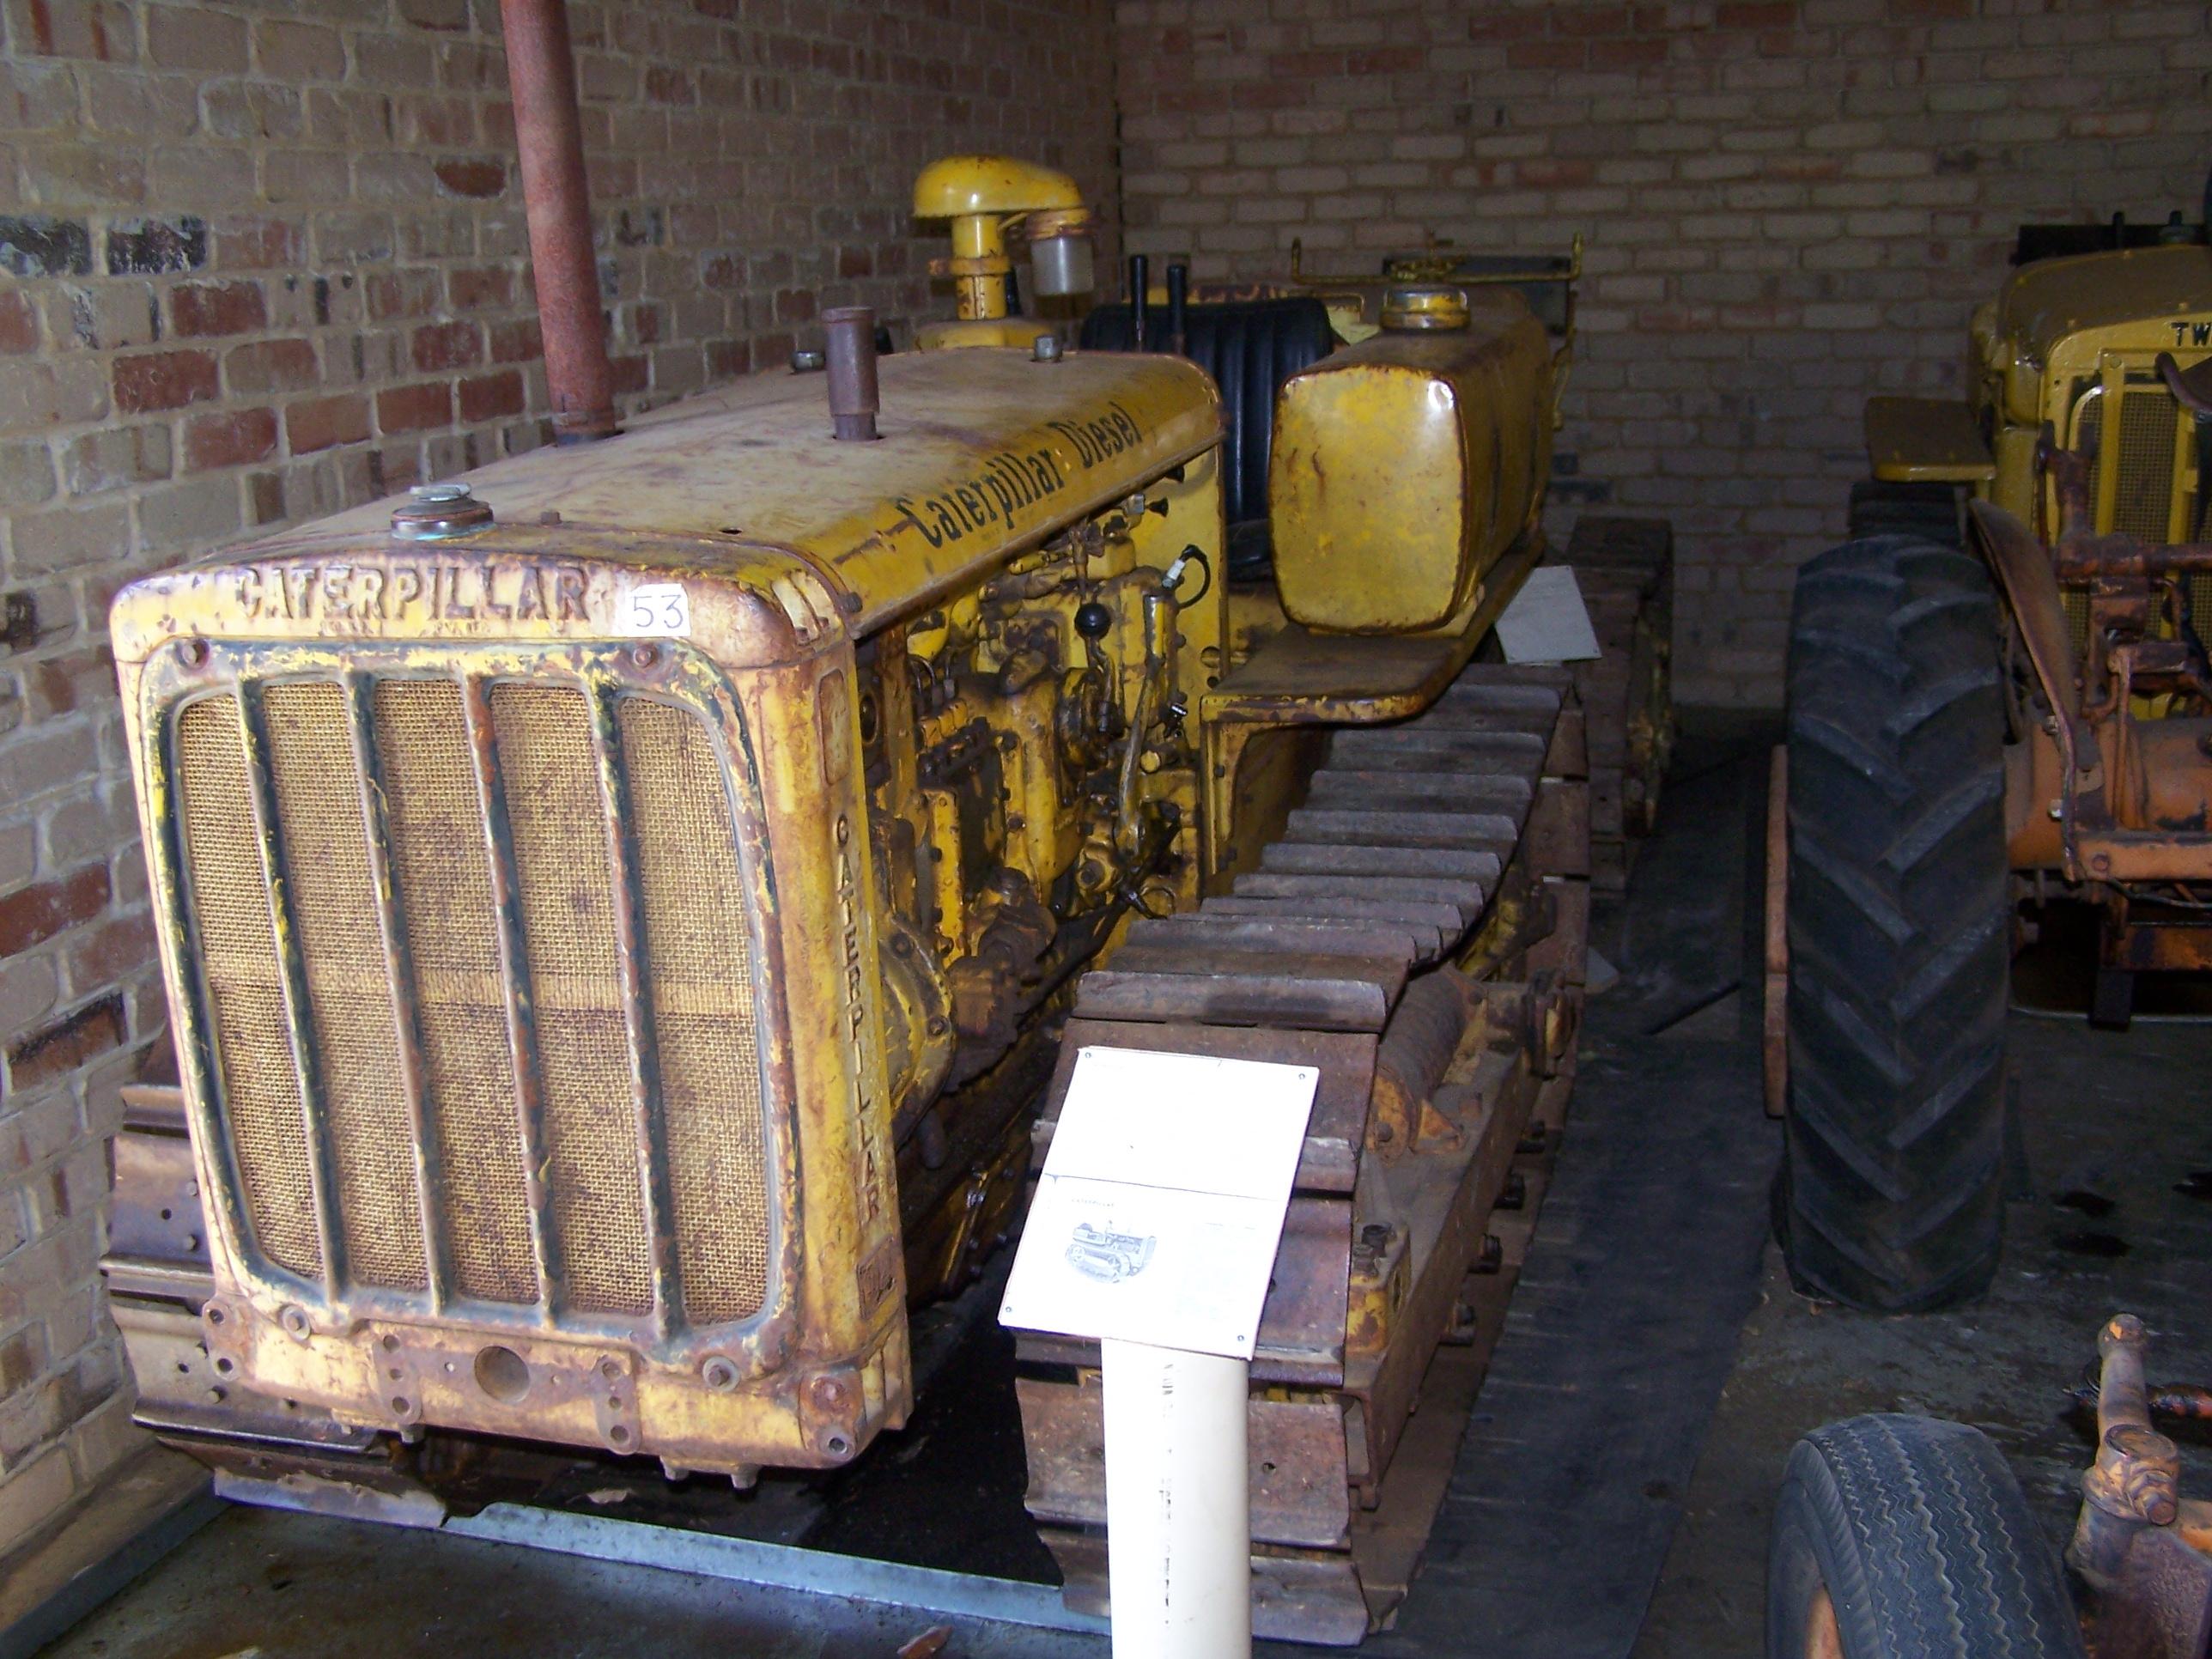 Caterpillar D2 on display in the Serpentine Vintage Tractor Museum, Serpentine, Western Australia